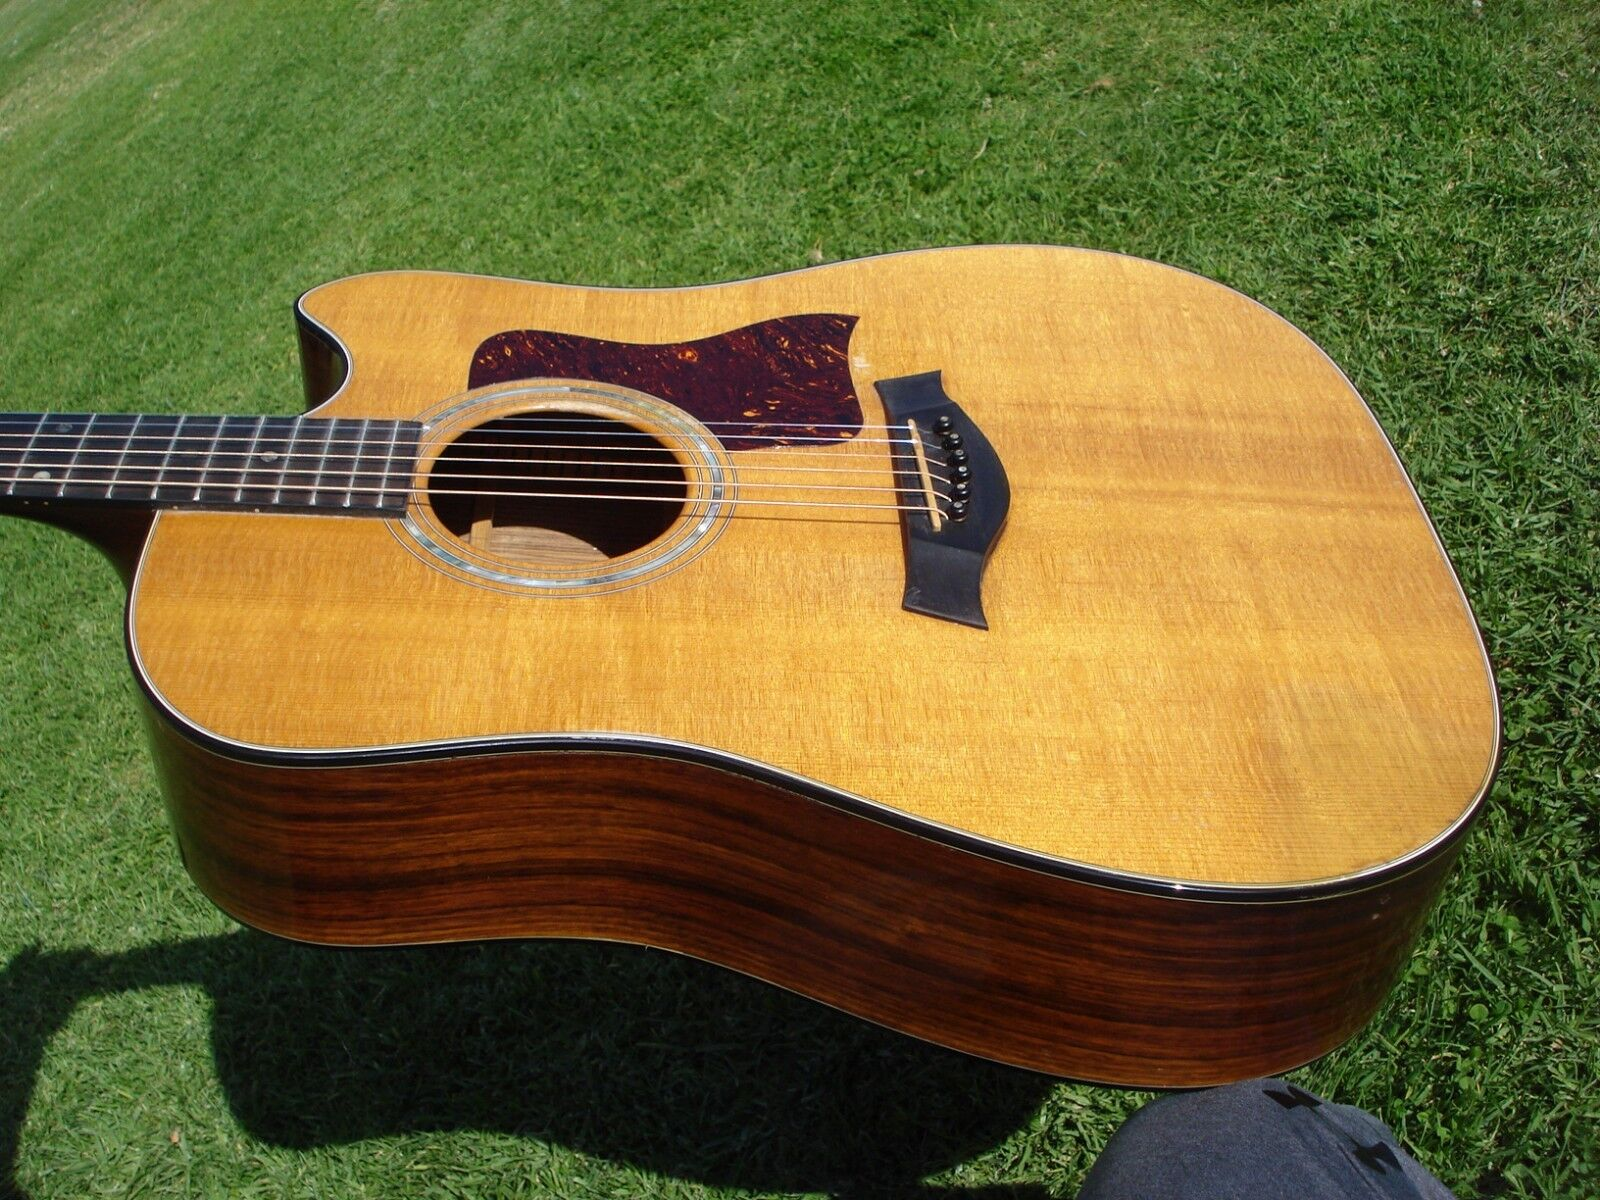 1992 Taylor 710 LTD Limited Acoustic Guitar - Santee, California + OHSC